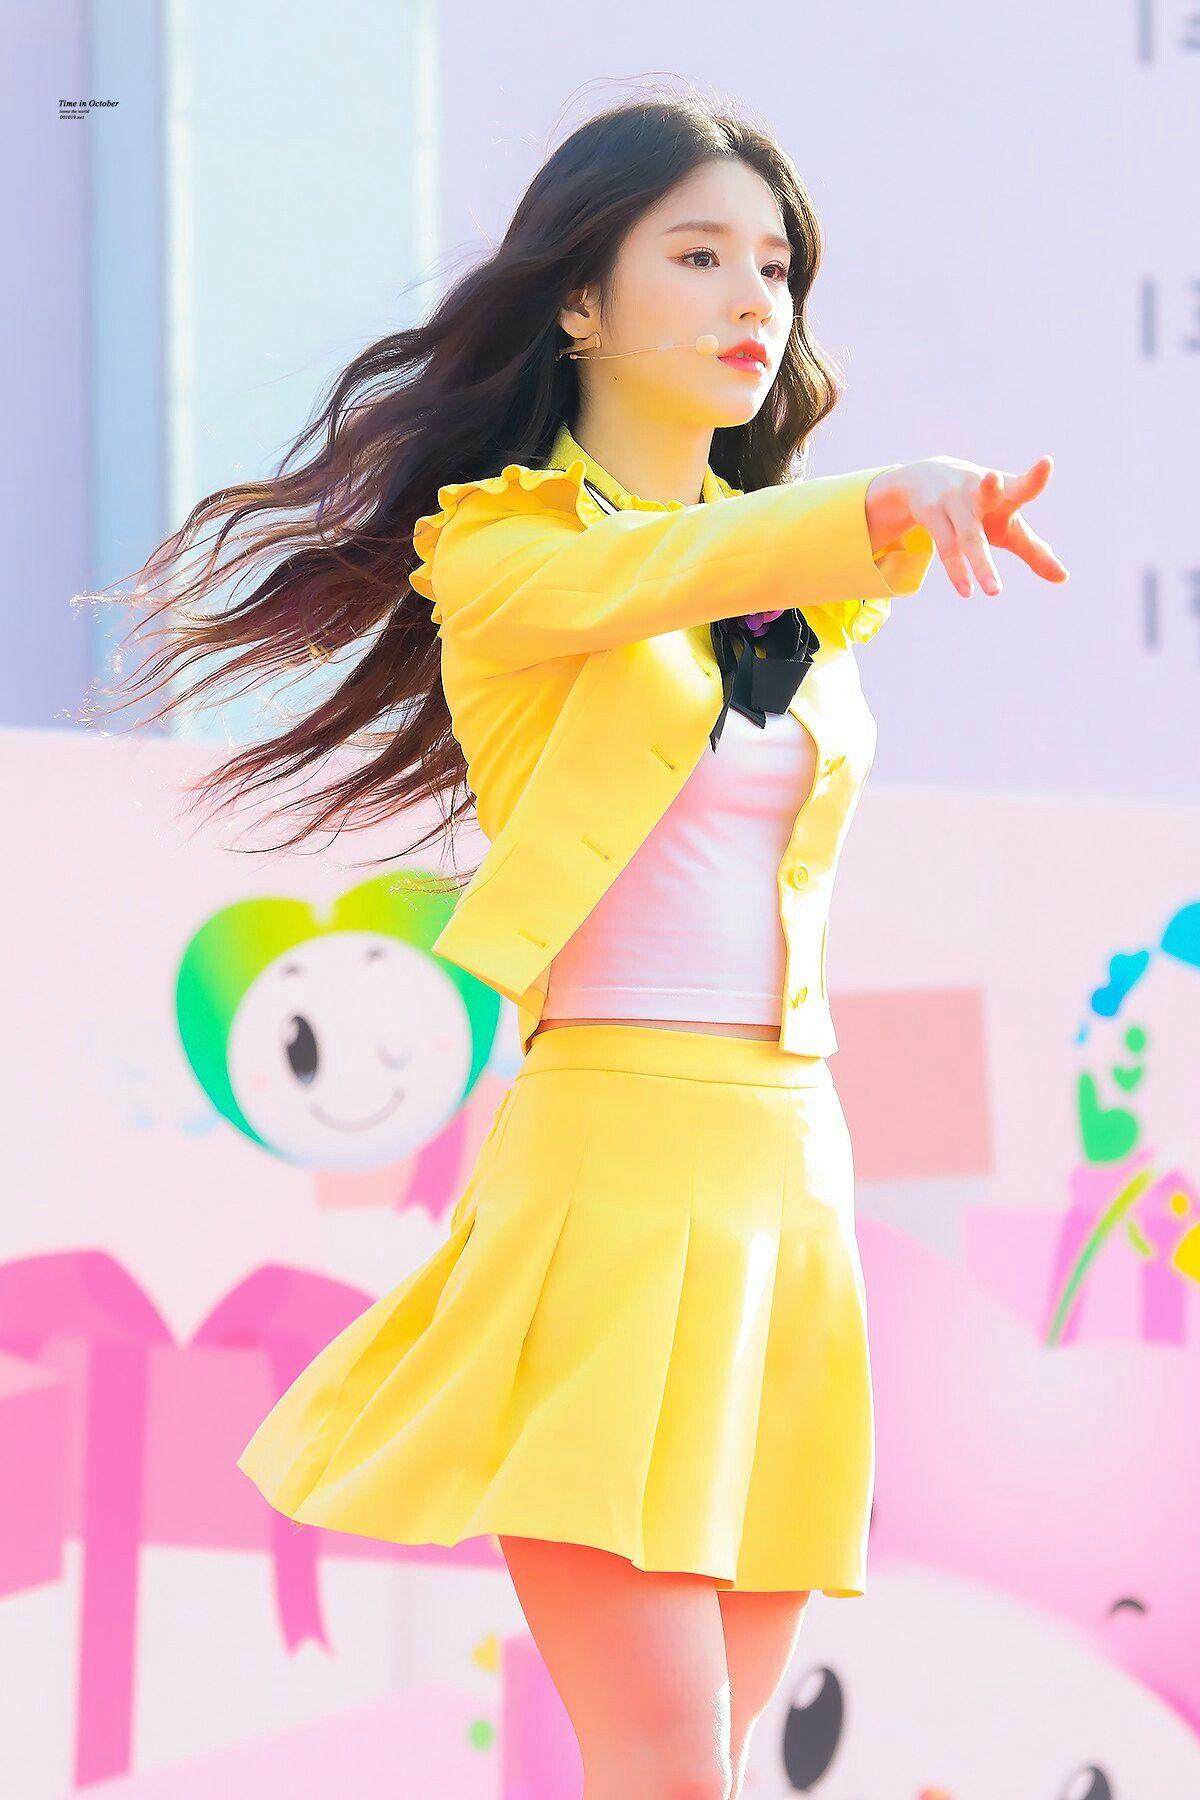 Pin by moonchild on LOOΠΔ   Kpop, Beautiful asian girls, Korean girl